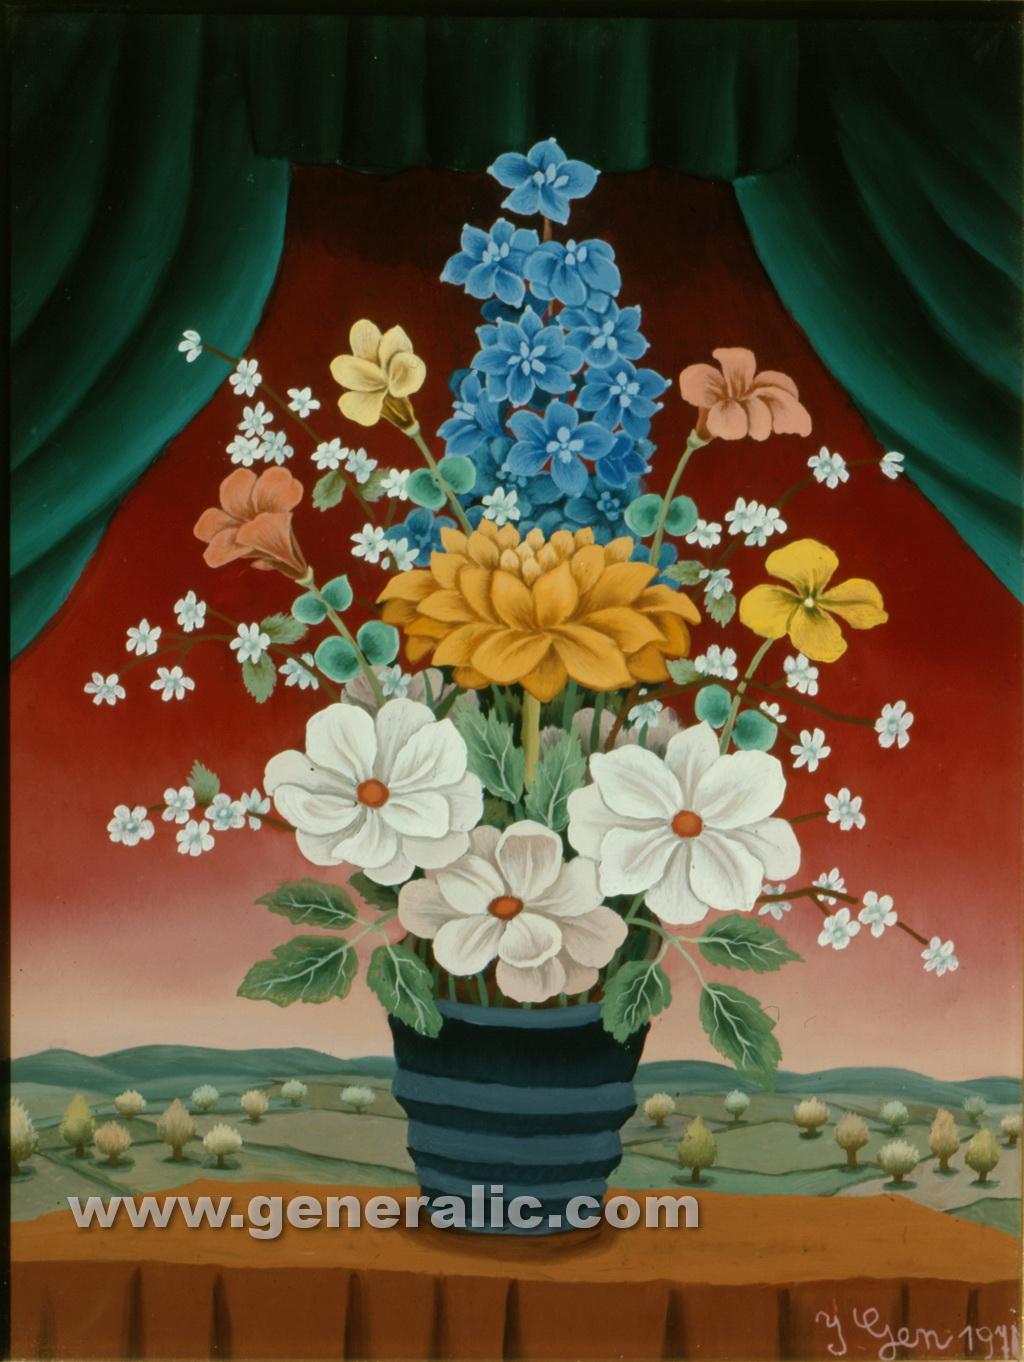 Ivan Generalic, 1970, Flowers on a table, oil on glass